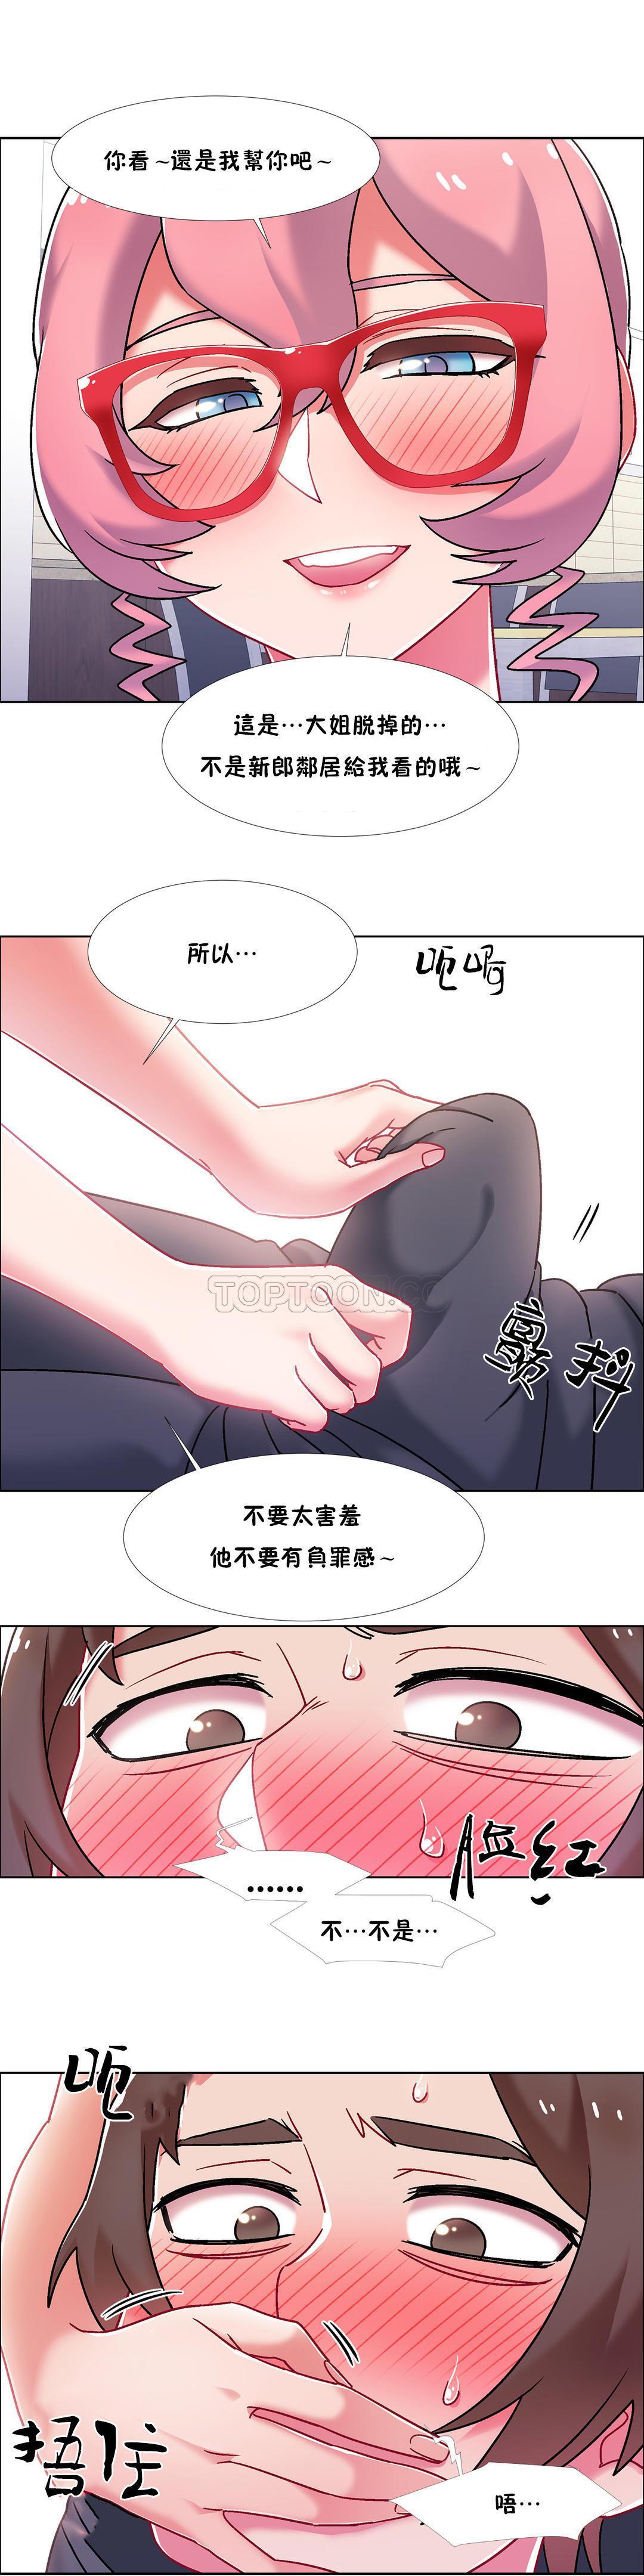 [Studio Wannabe] Rental Girls | 出租女郎 Ch. 33-58 [Chinese]  第二季 完结 337